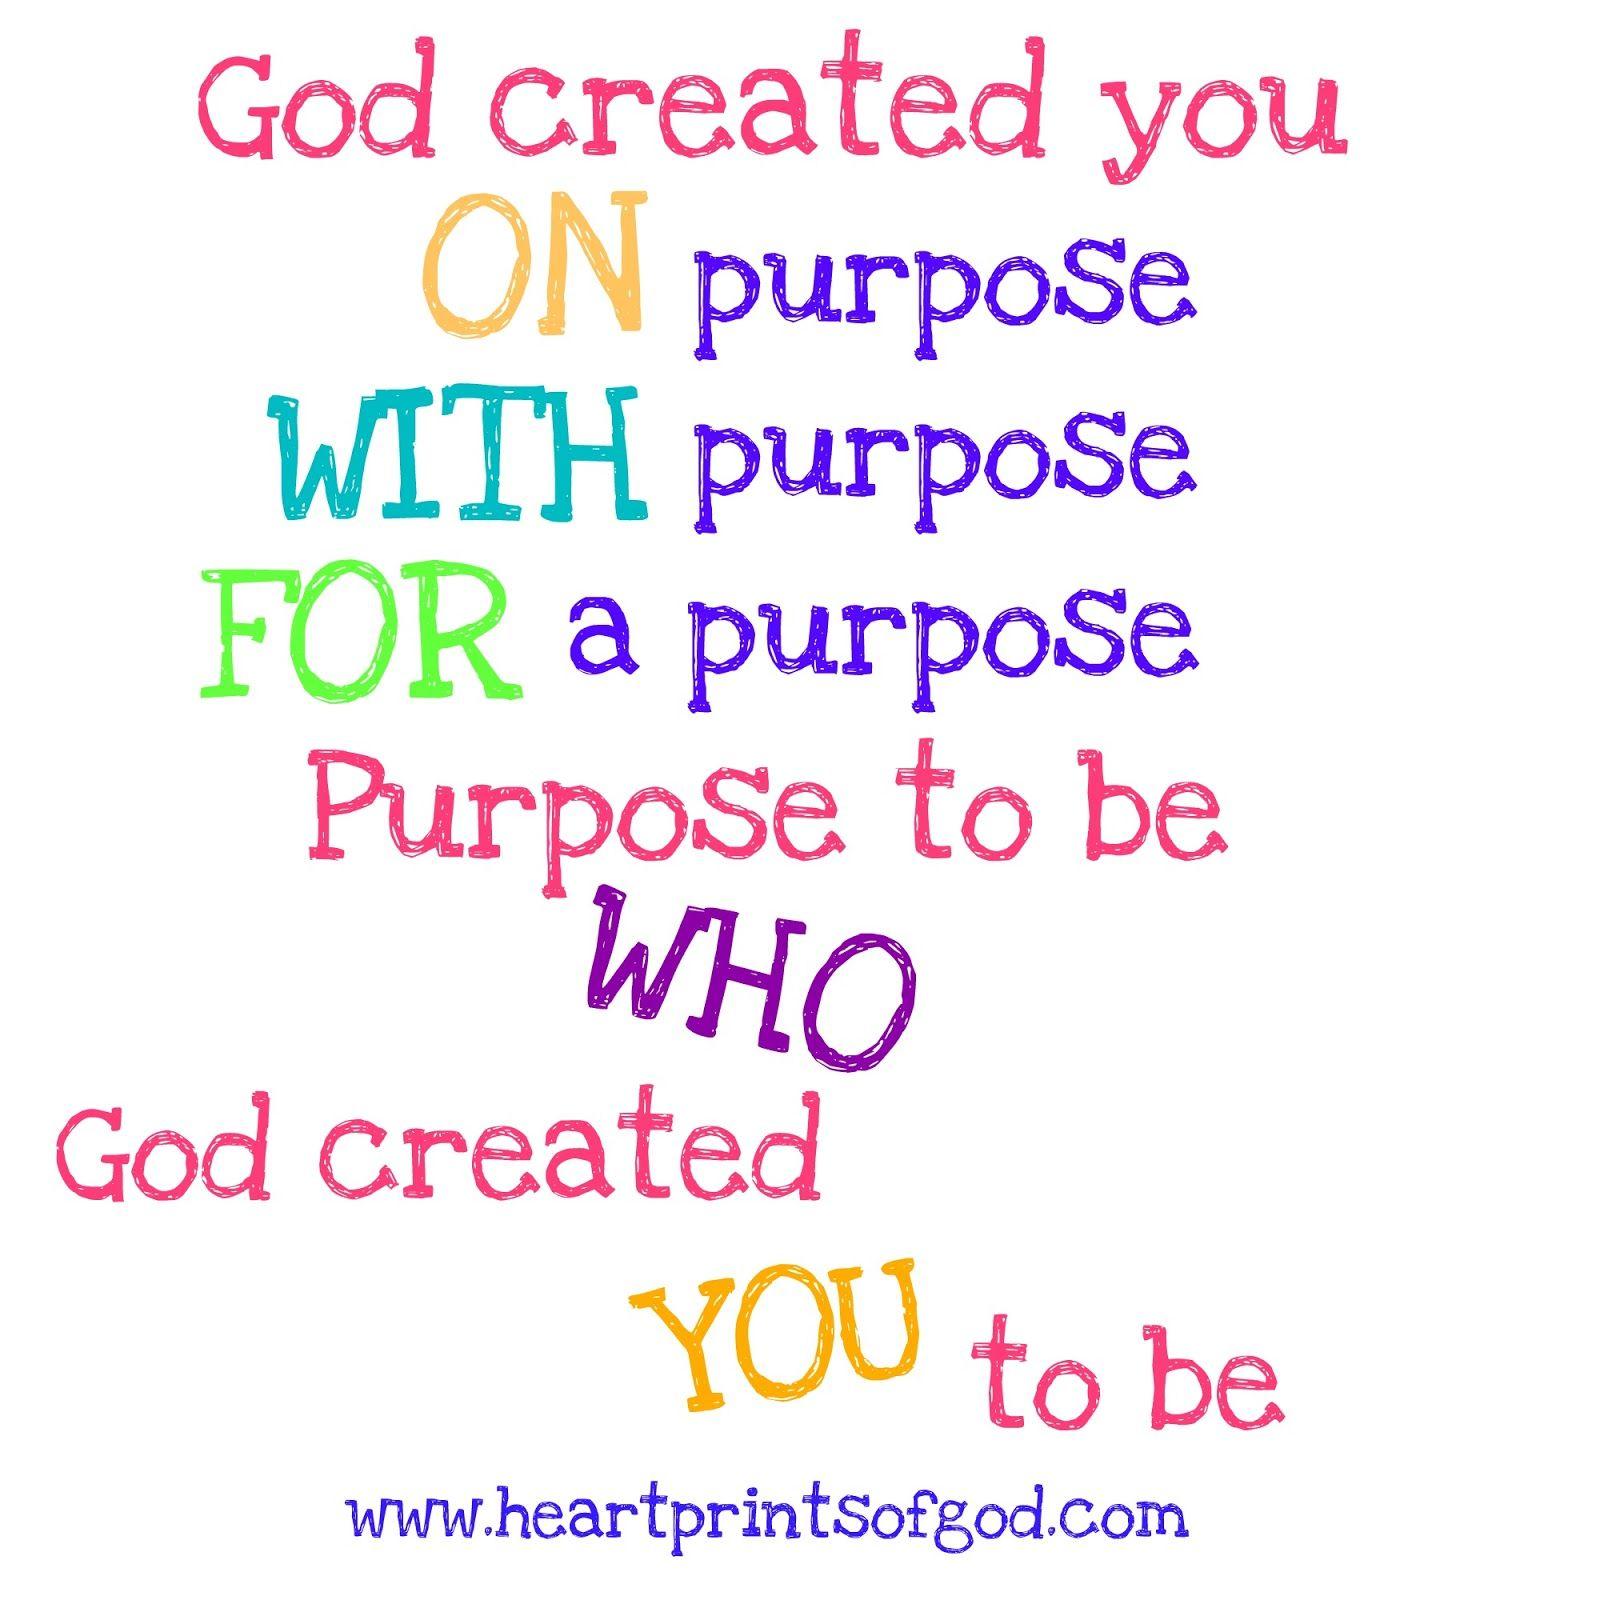 Heartprints of god do iton purpose day 31 make it